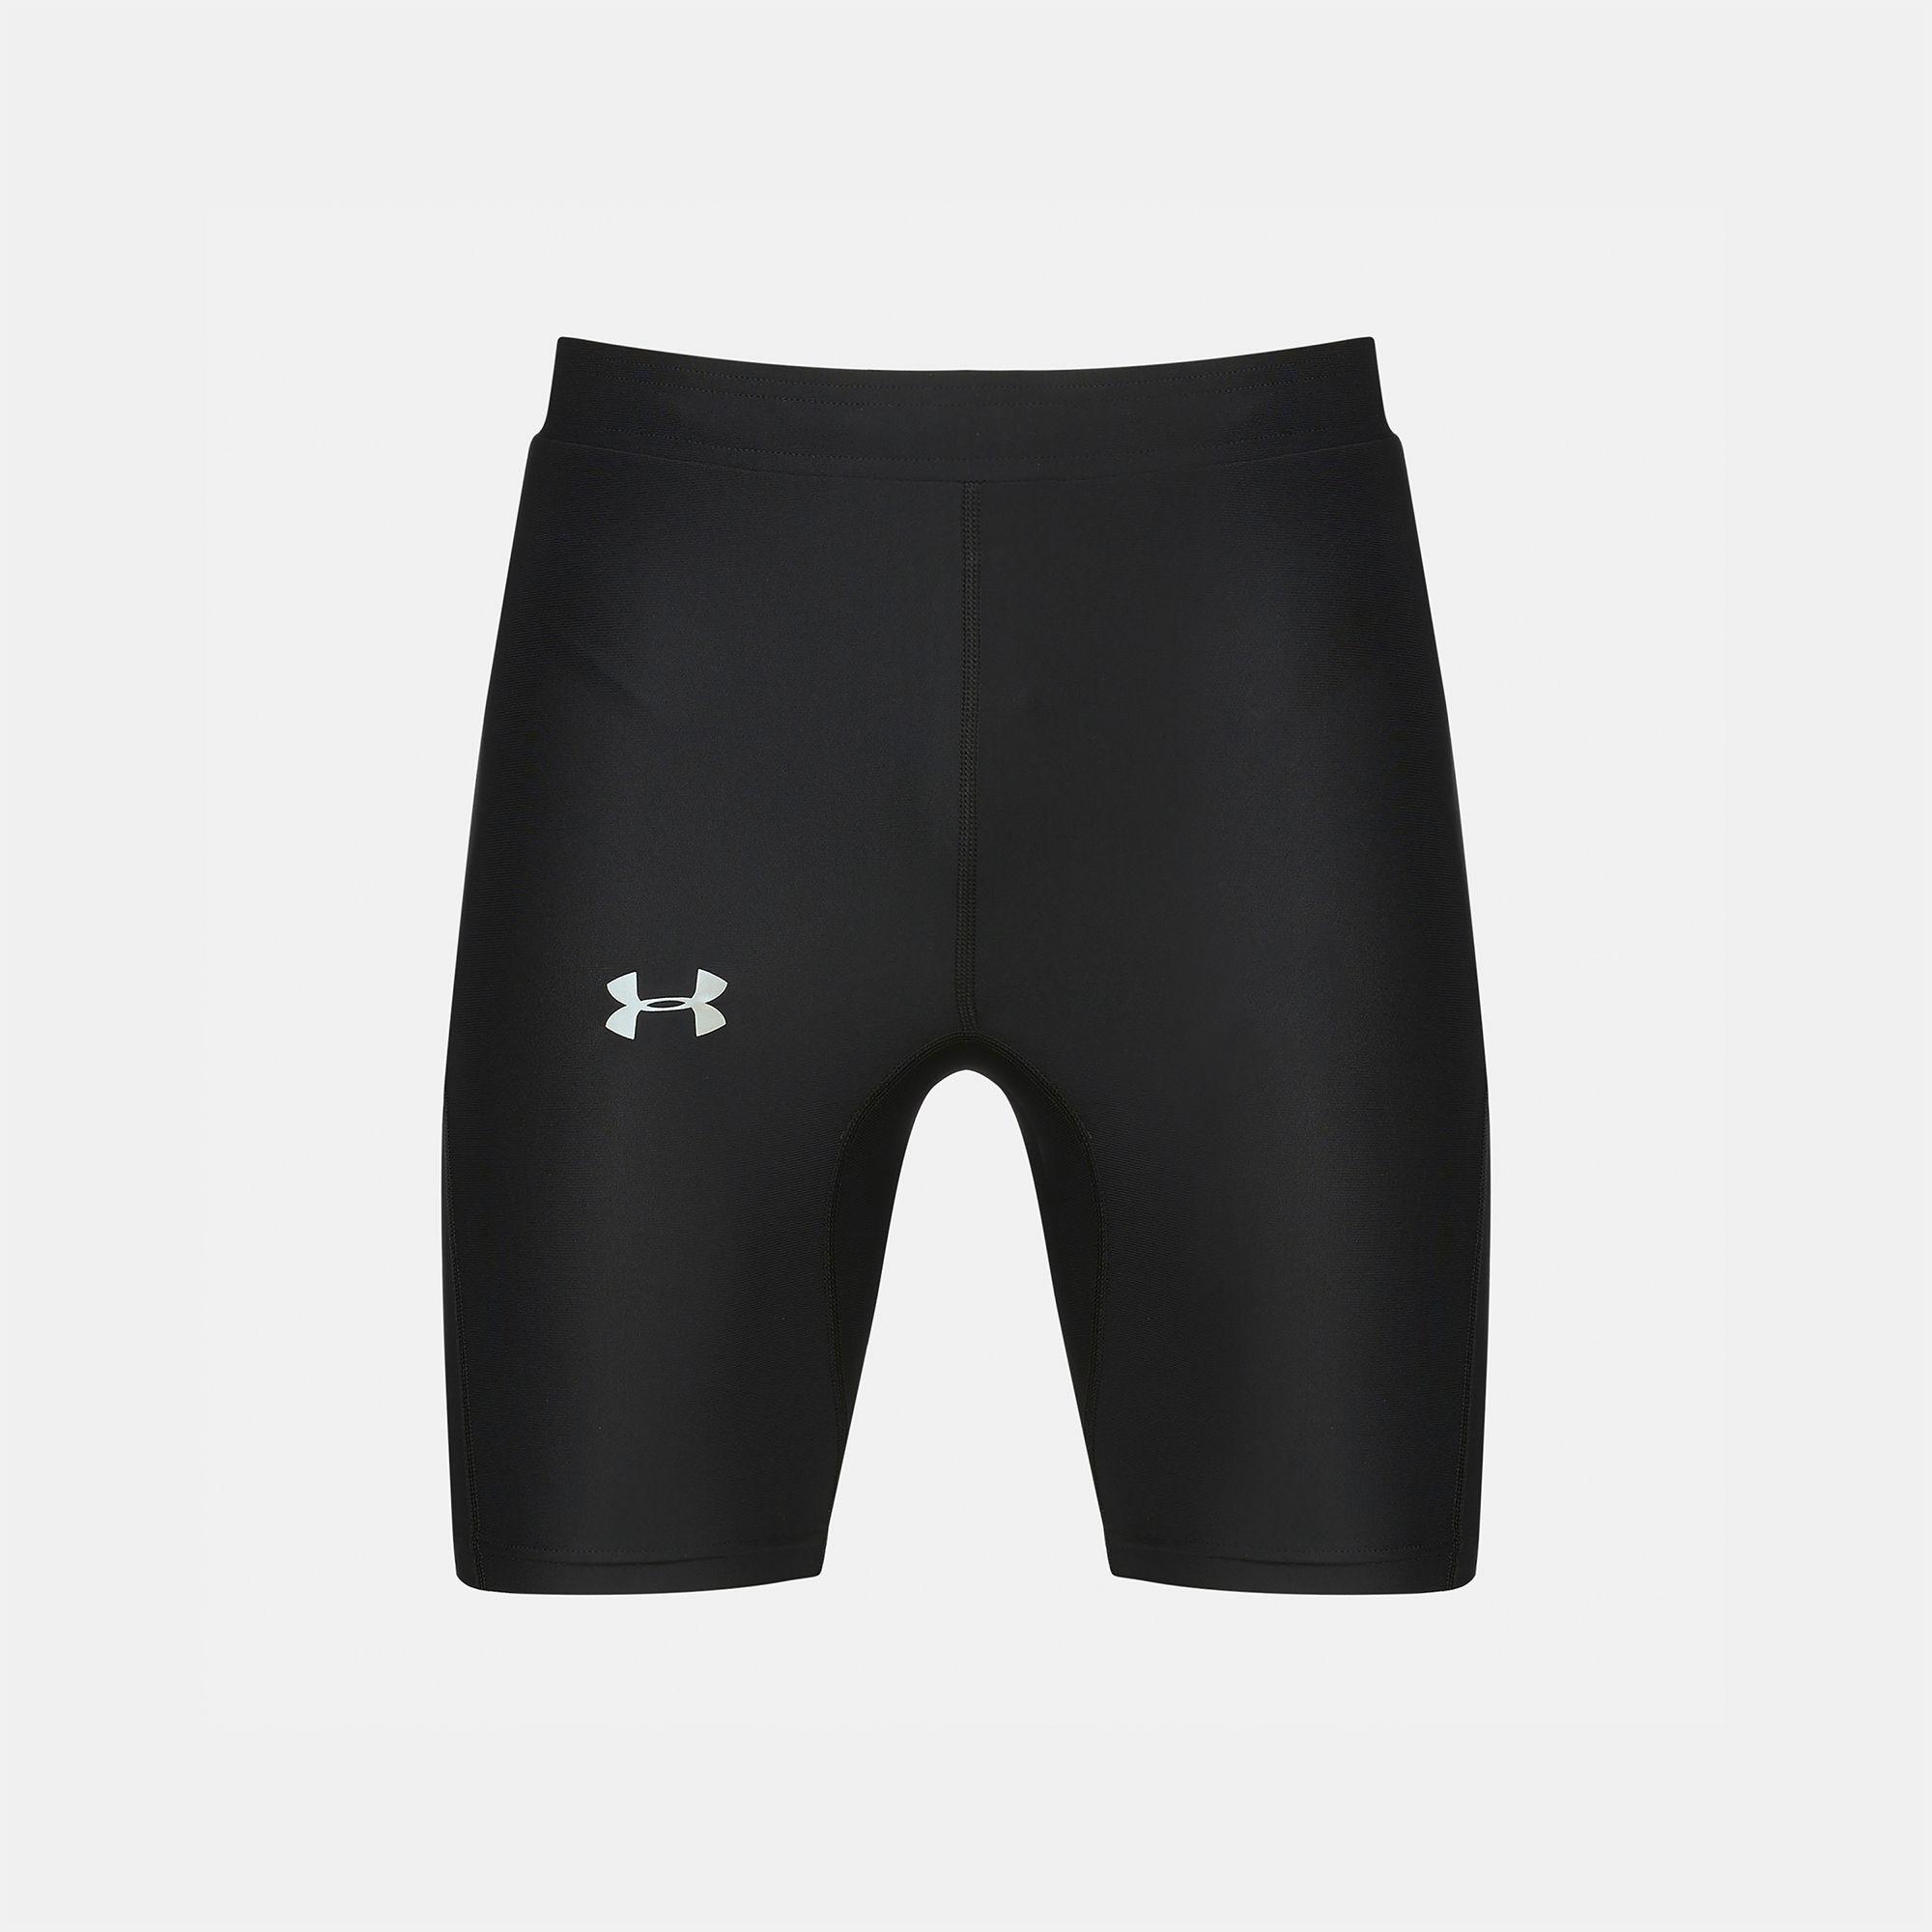 a452ff1f3a372 Shop Black Under Armour Run True Half Tight Running Shorts for Mens ...